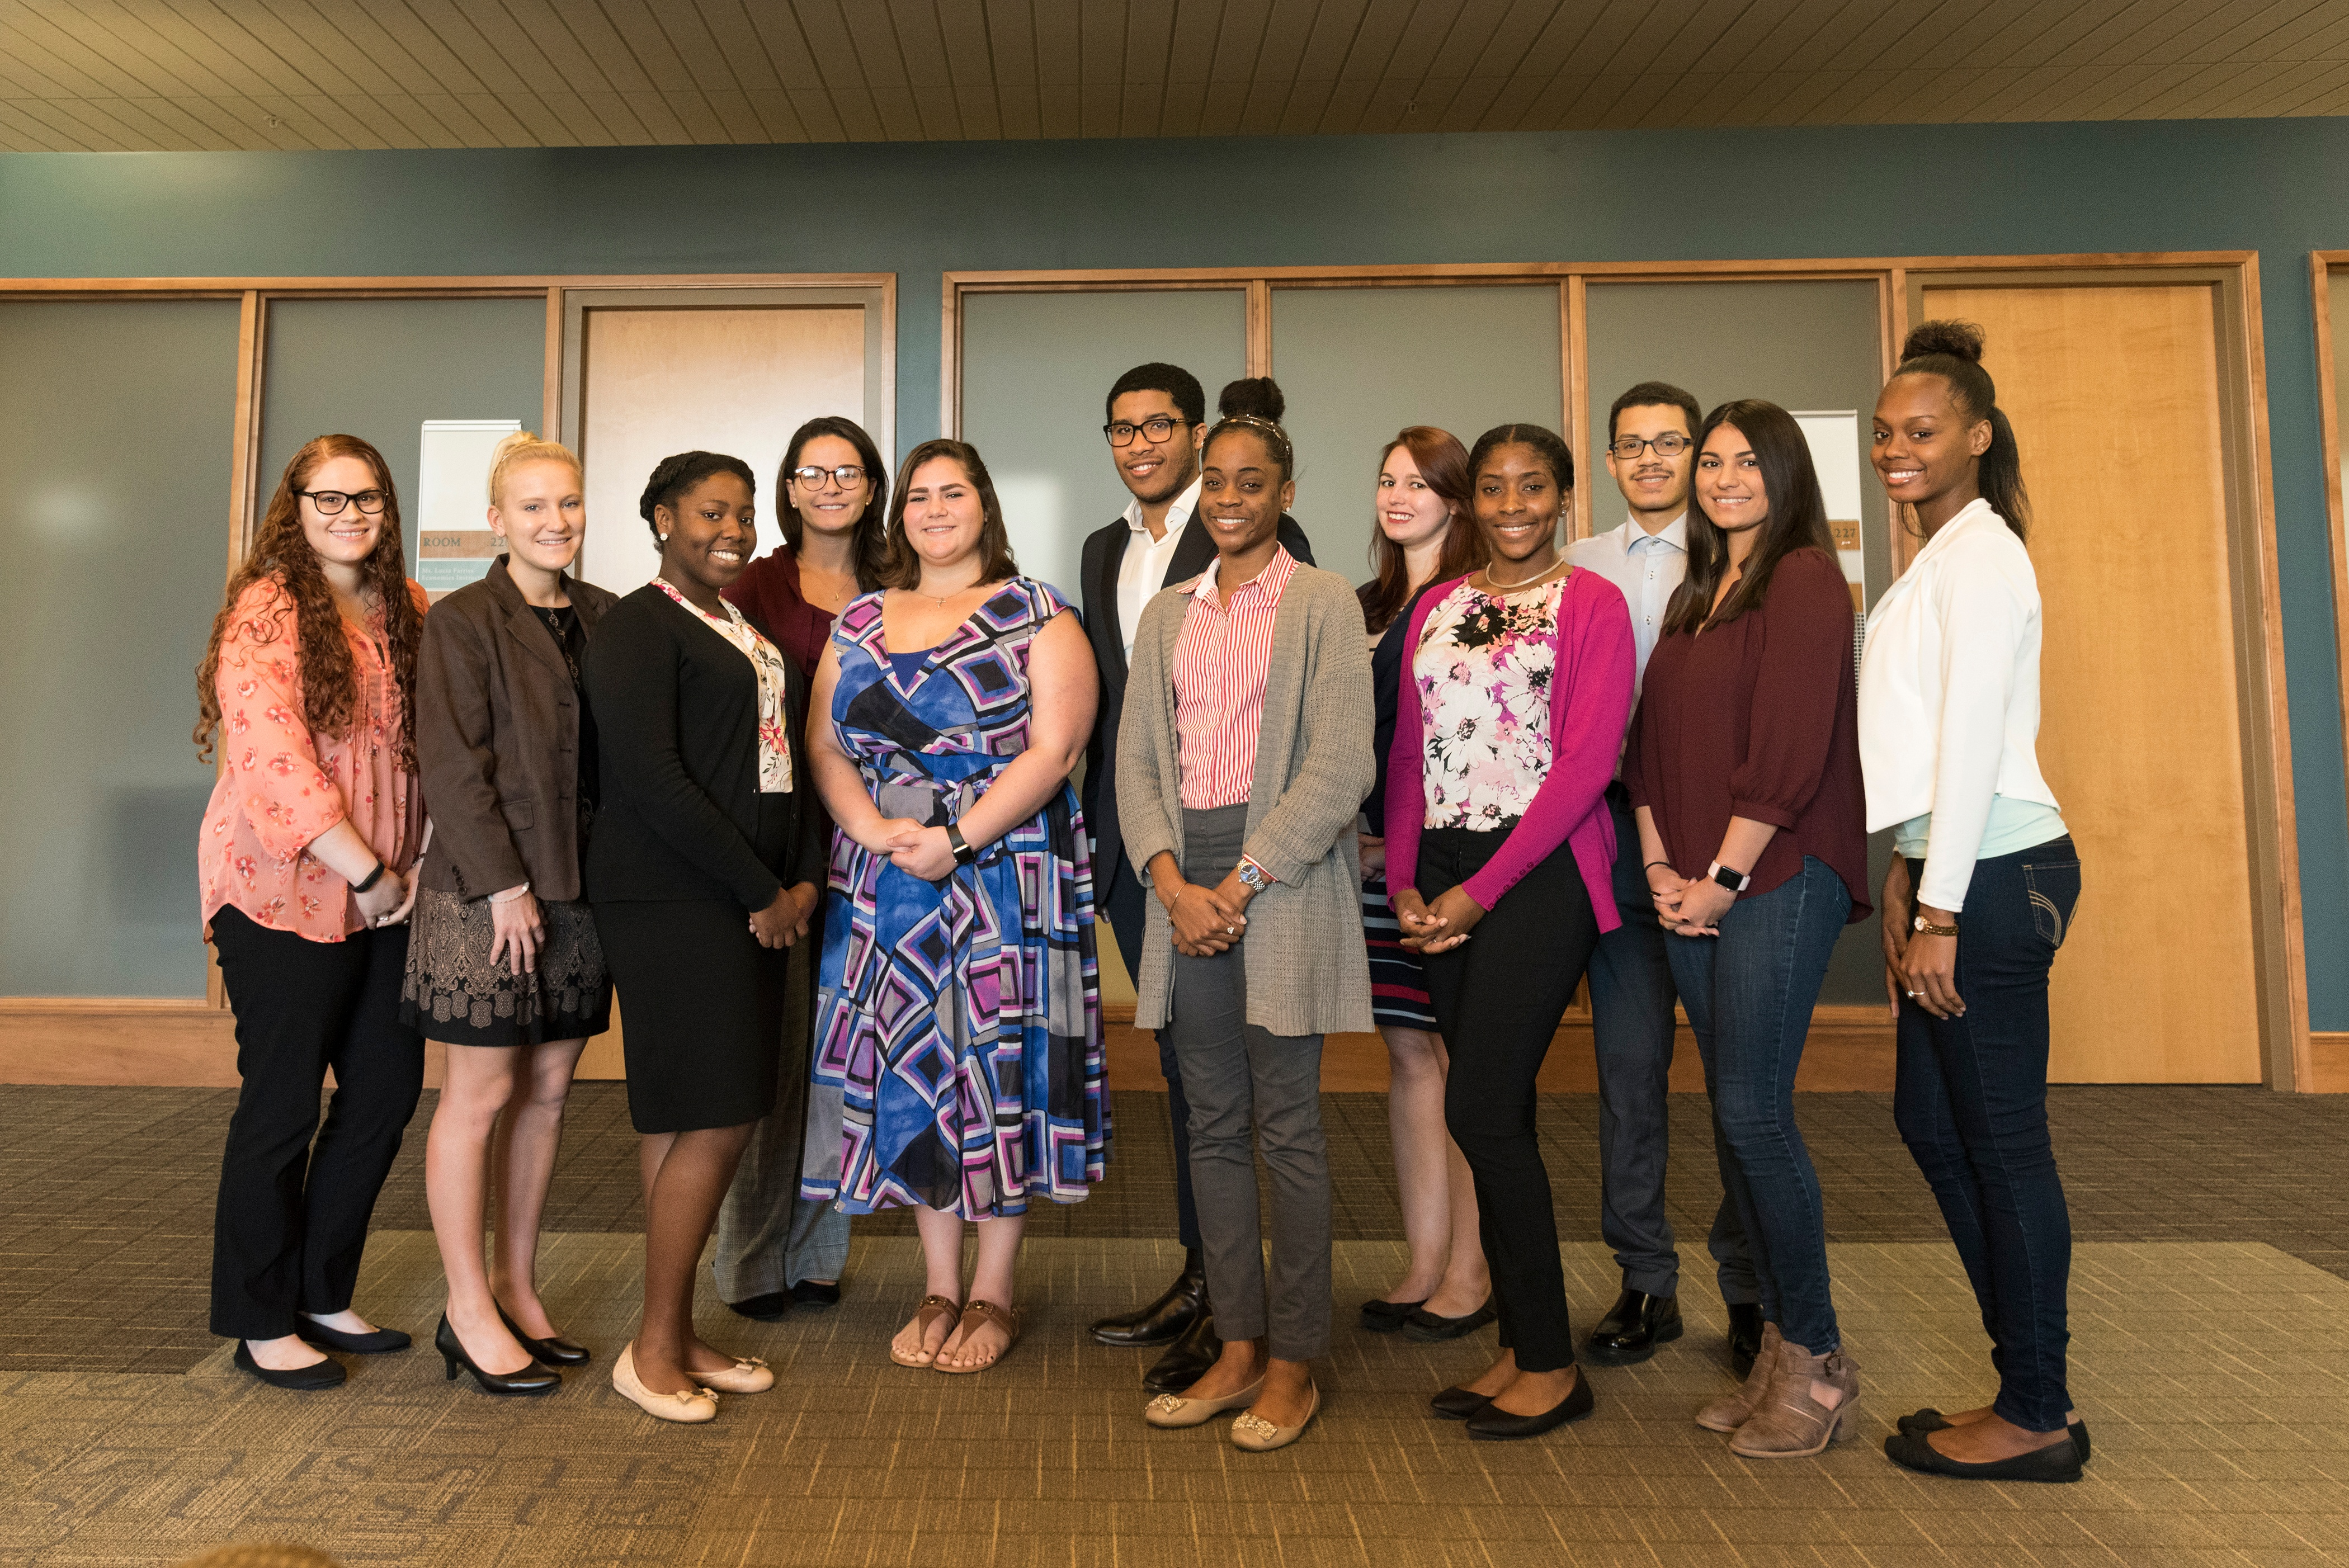 PwC students group photo 1.jpg